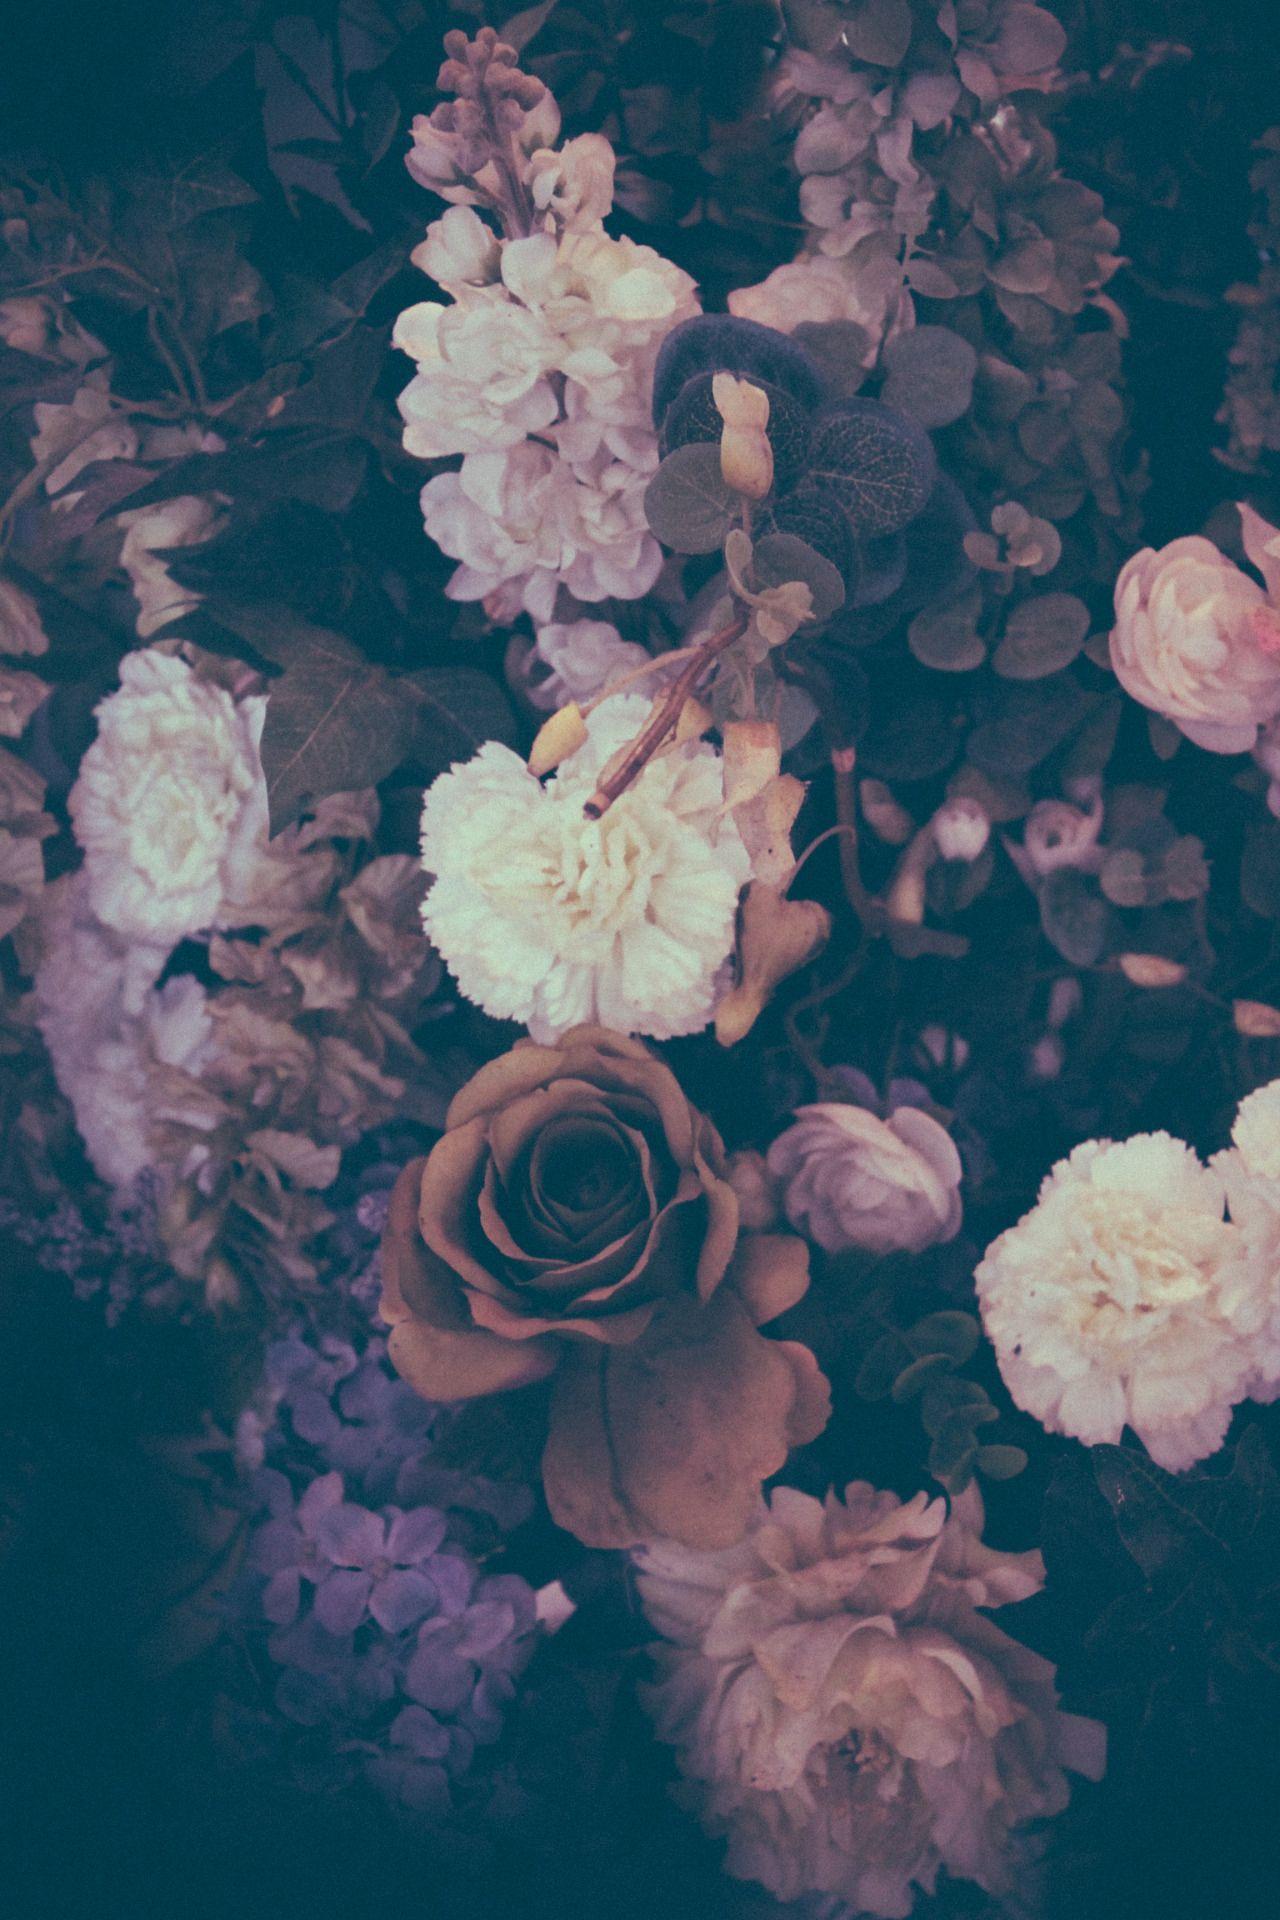 Astheticwallpaperiphonebackgrounds Vintage Flower Backgrounds Best Flower Wallpaper Flower Wallpaper